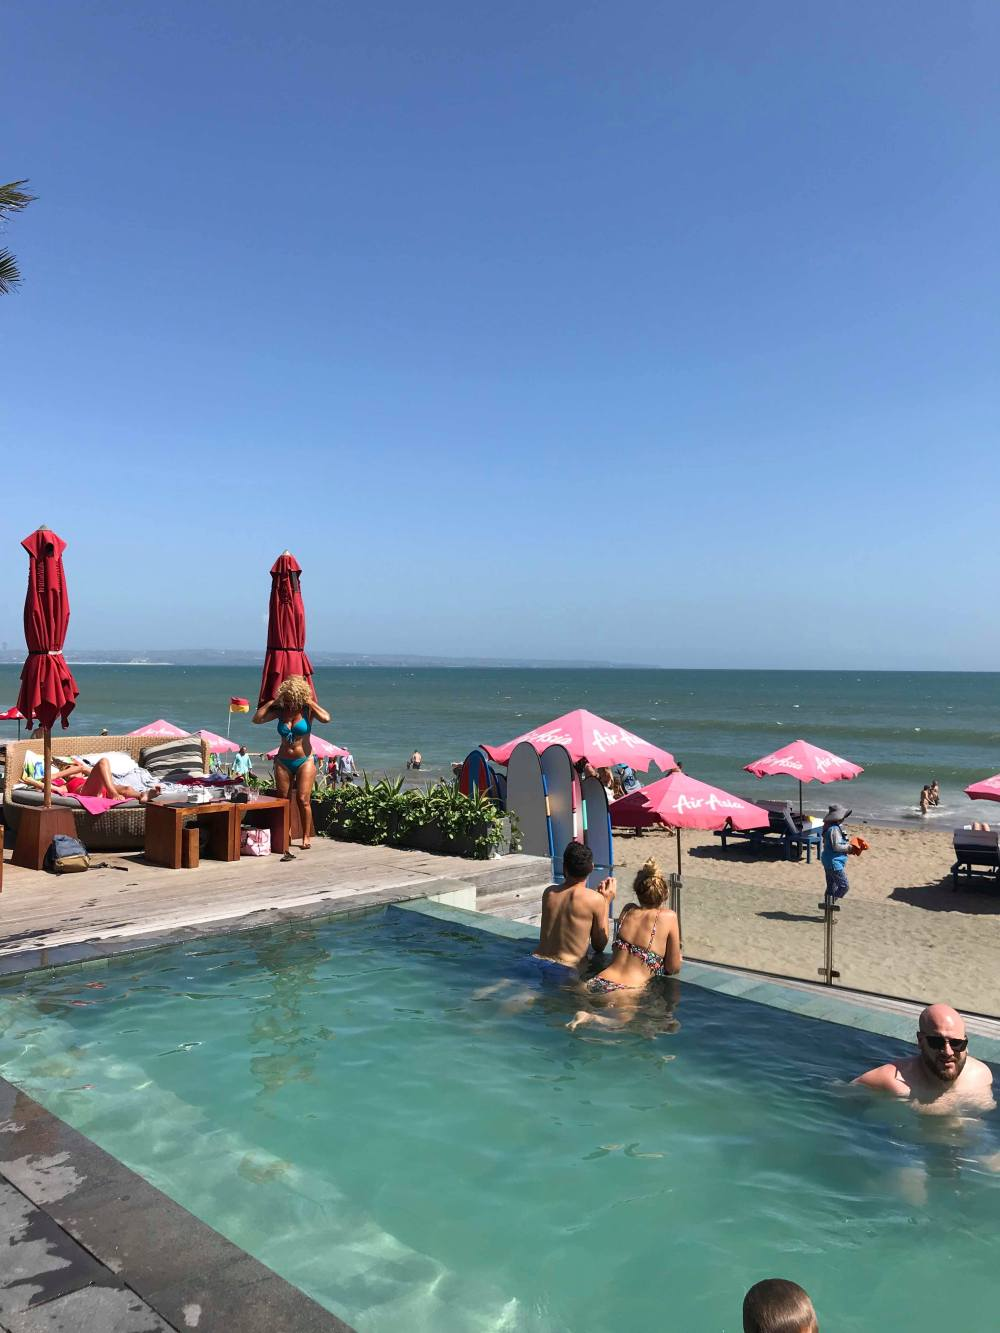 KU DE TA beach club view from pool